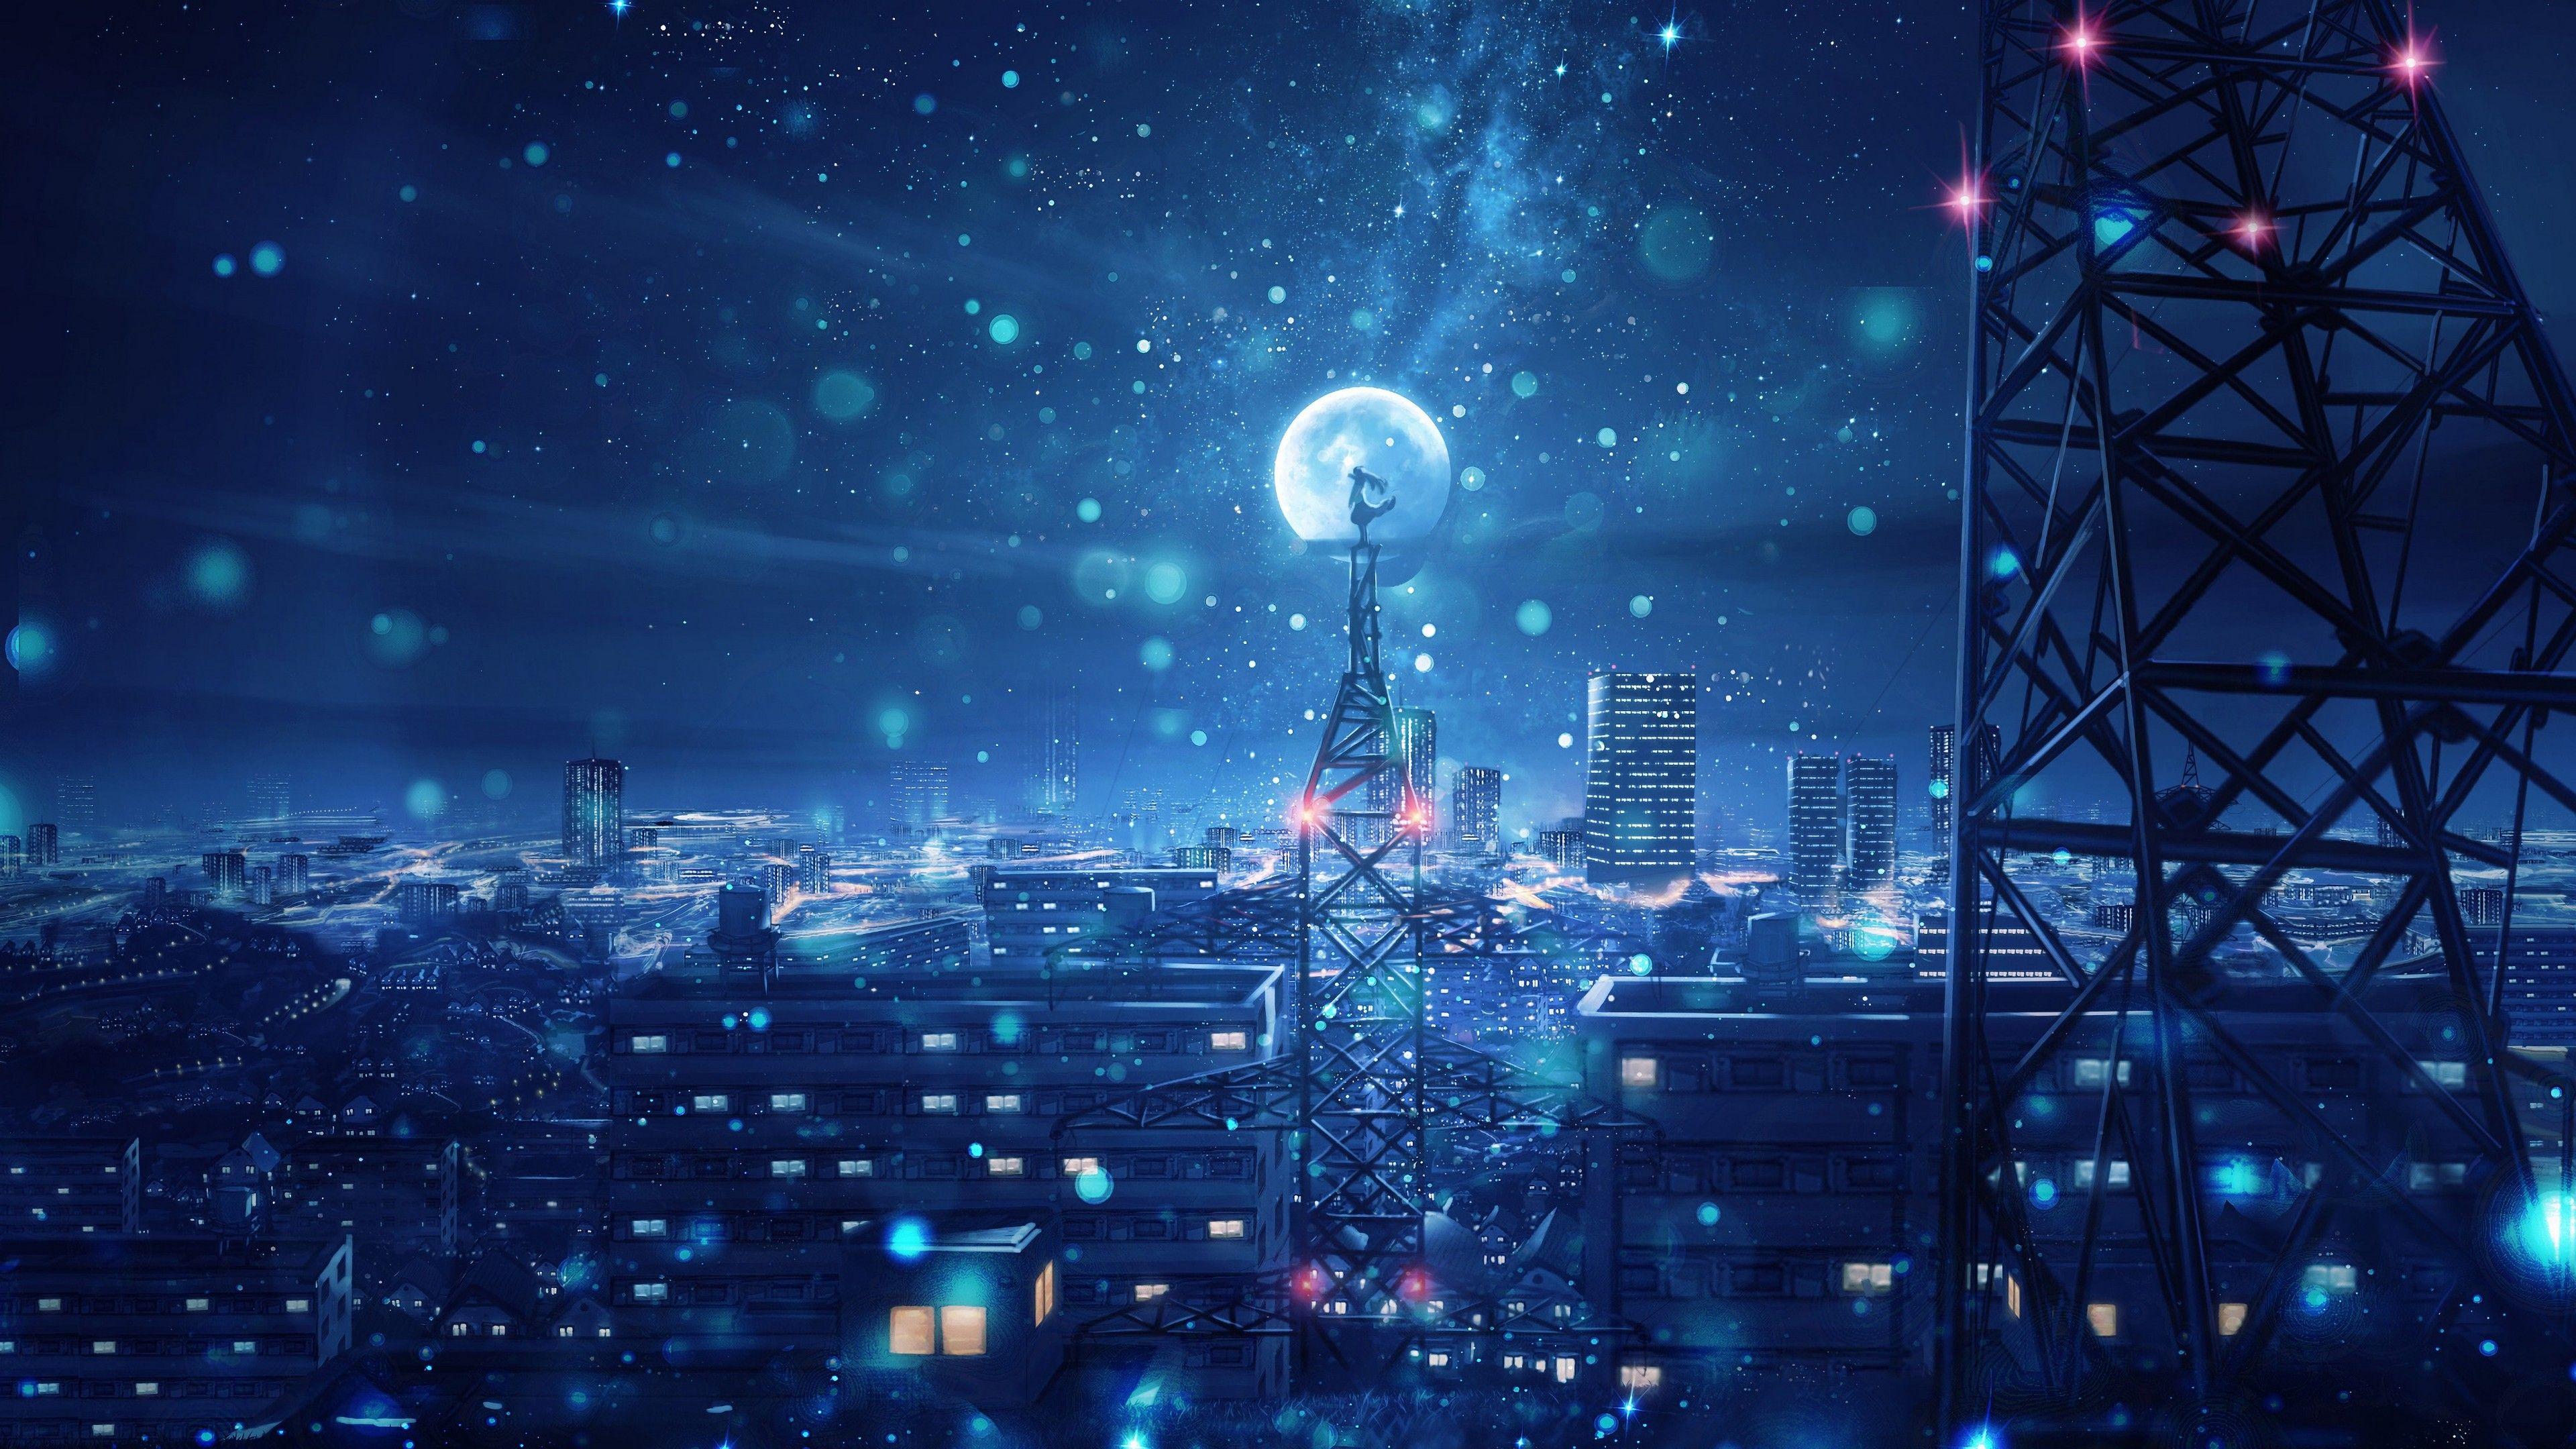 Blue Night Big Moon Anime Scenery Scenery Wallpapers Night Wallpapers Hd Wallpapers Anime Wallpapers Night Sky Wallpaper Sky Anime Anime Scenery Wallpaper